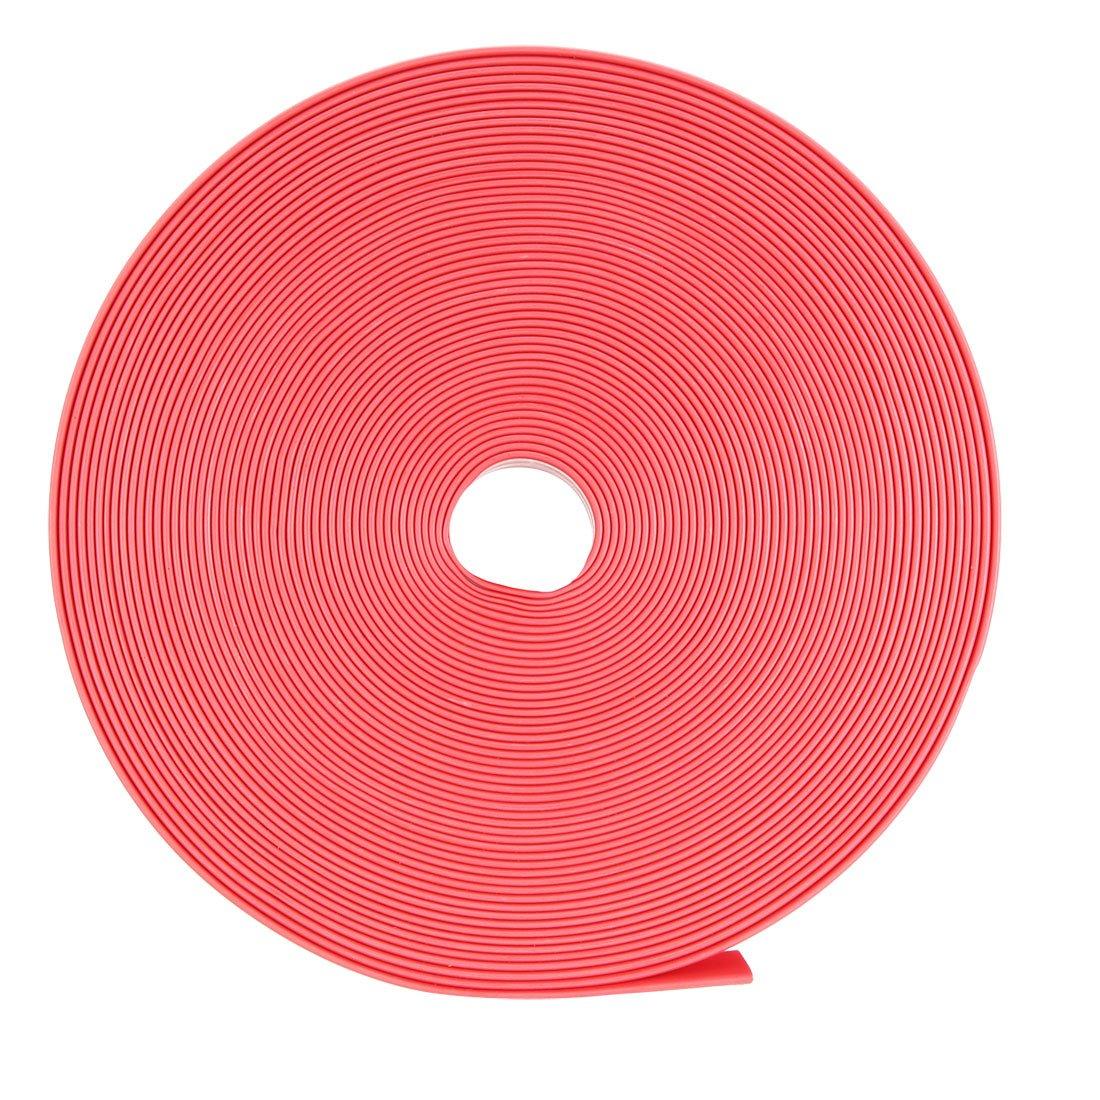 uxcell Heat Shrink Tubing, 14mm Dia 23mm Flat Width 2:1 Heat Shrink Wrap Cable Sleeve Heatshrink Tube 10m Red